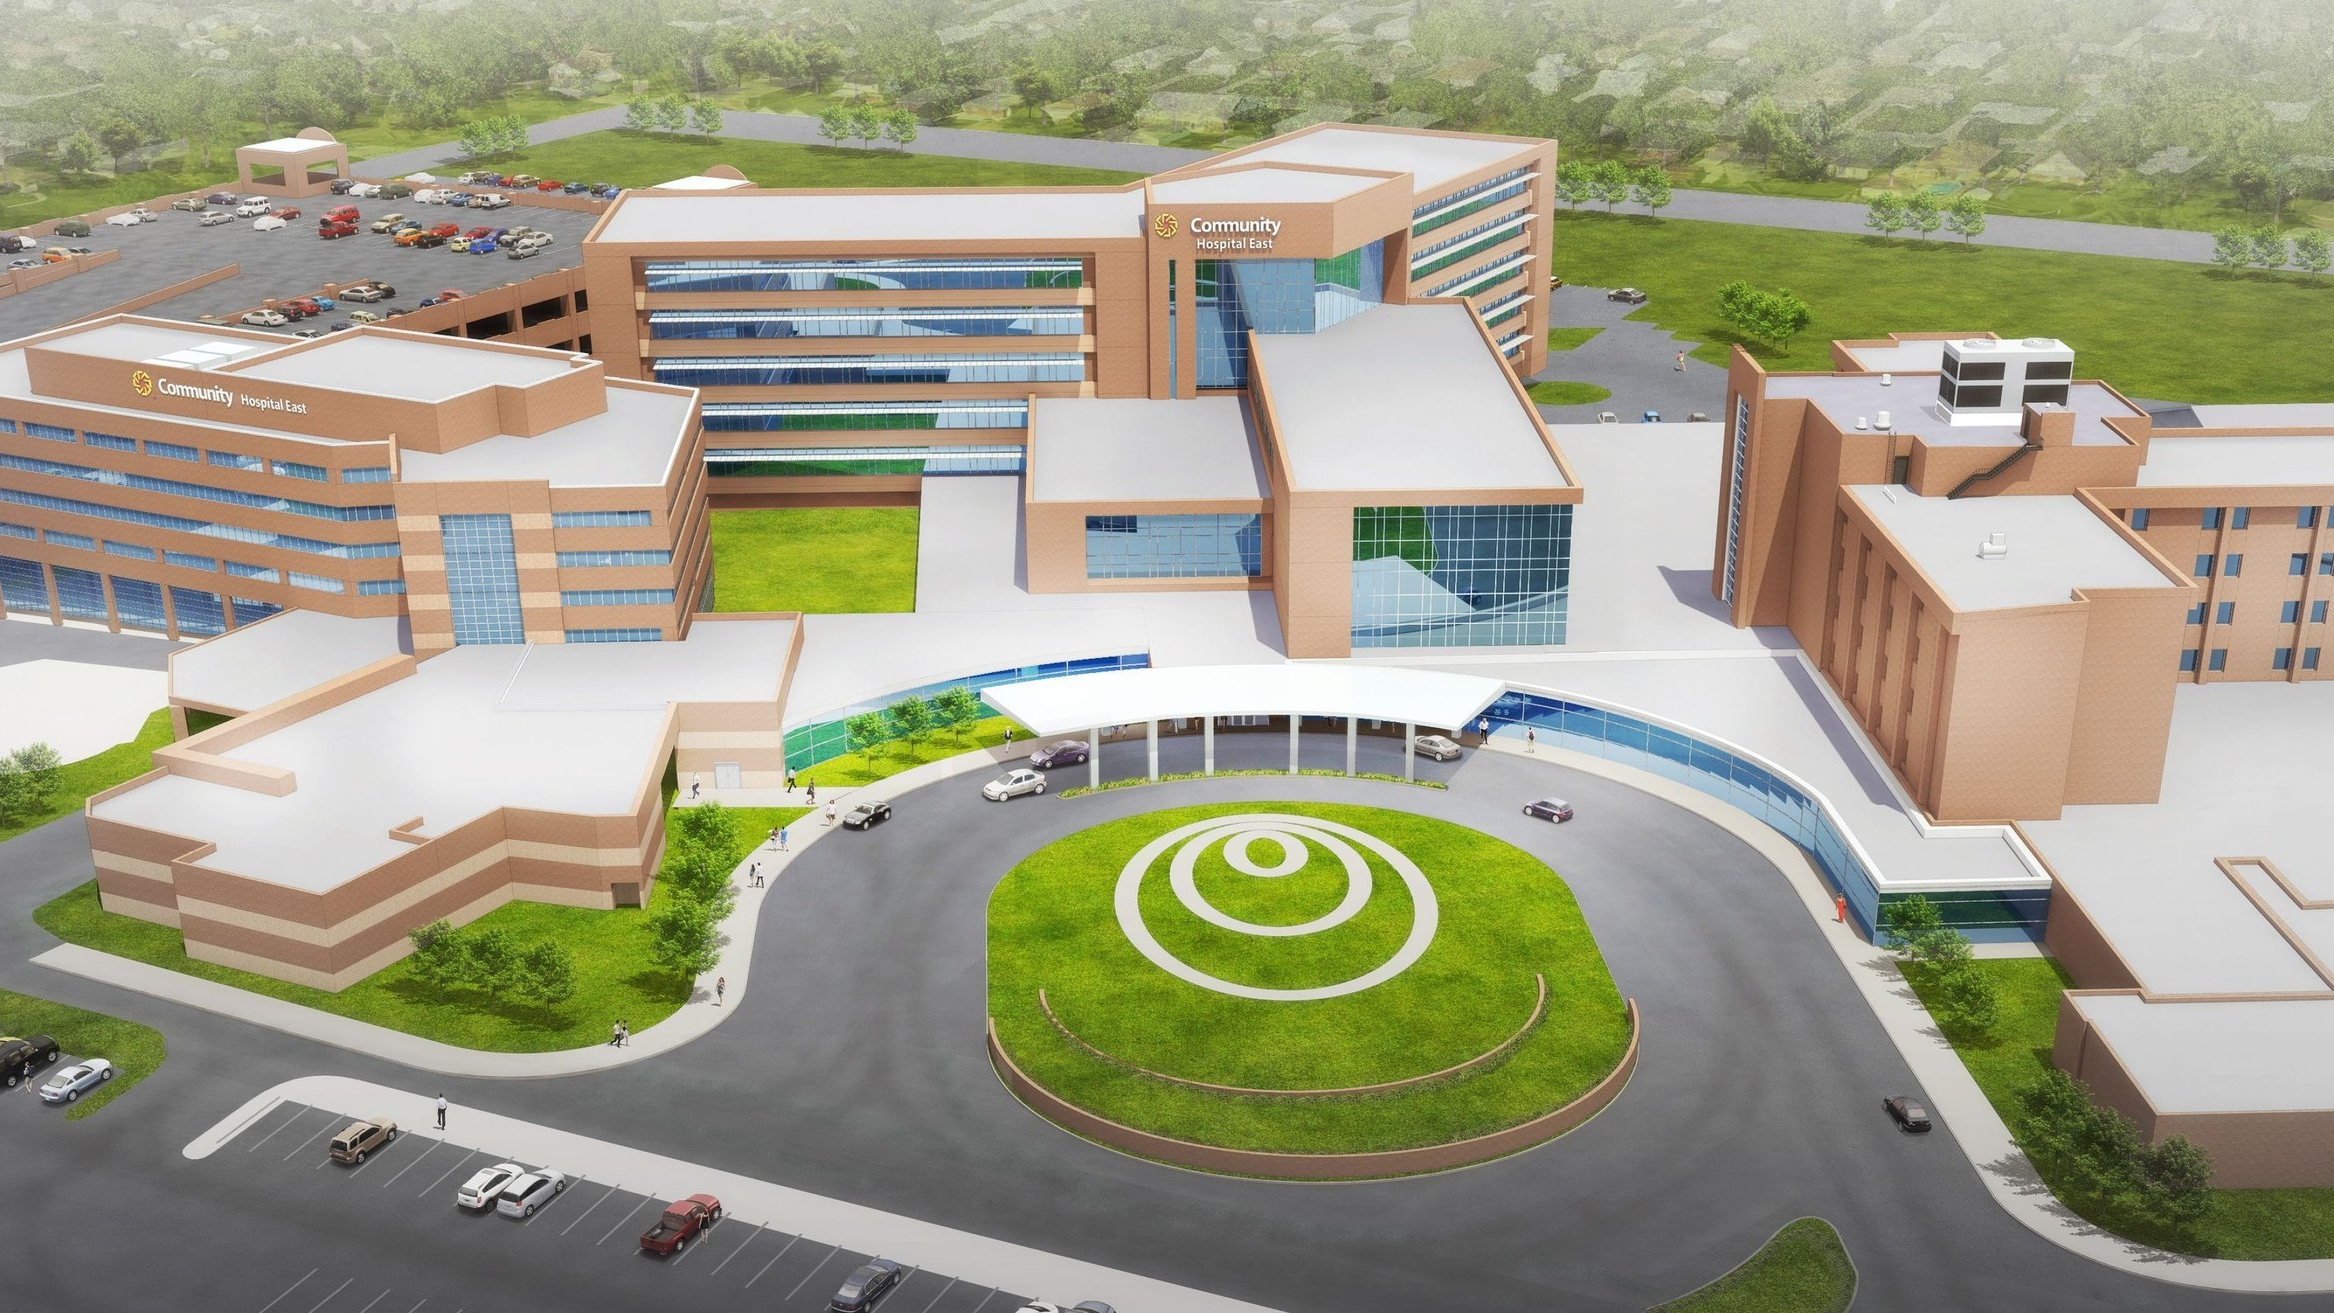 Healthcare program Development.CCIP Facilitation.Onsite Safety Support. - Community Health Network - Community Hospital East Renovation Project